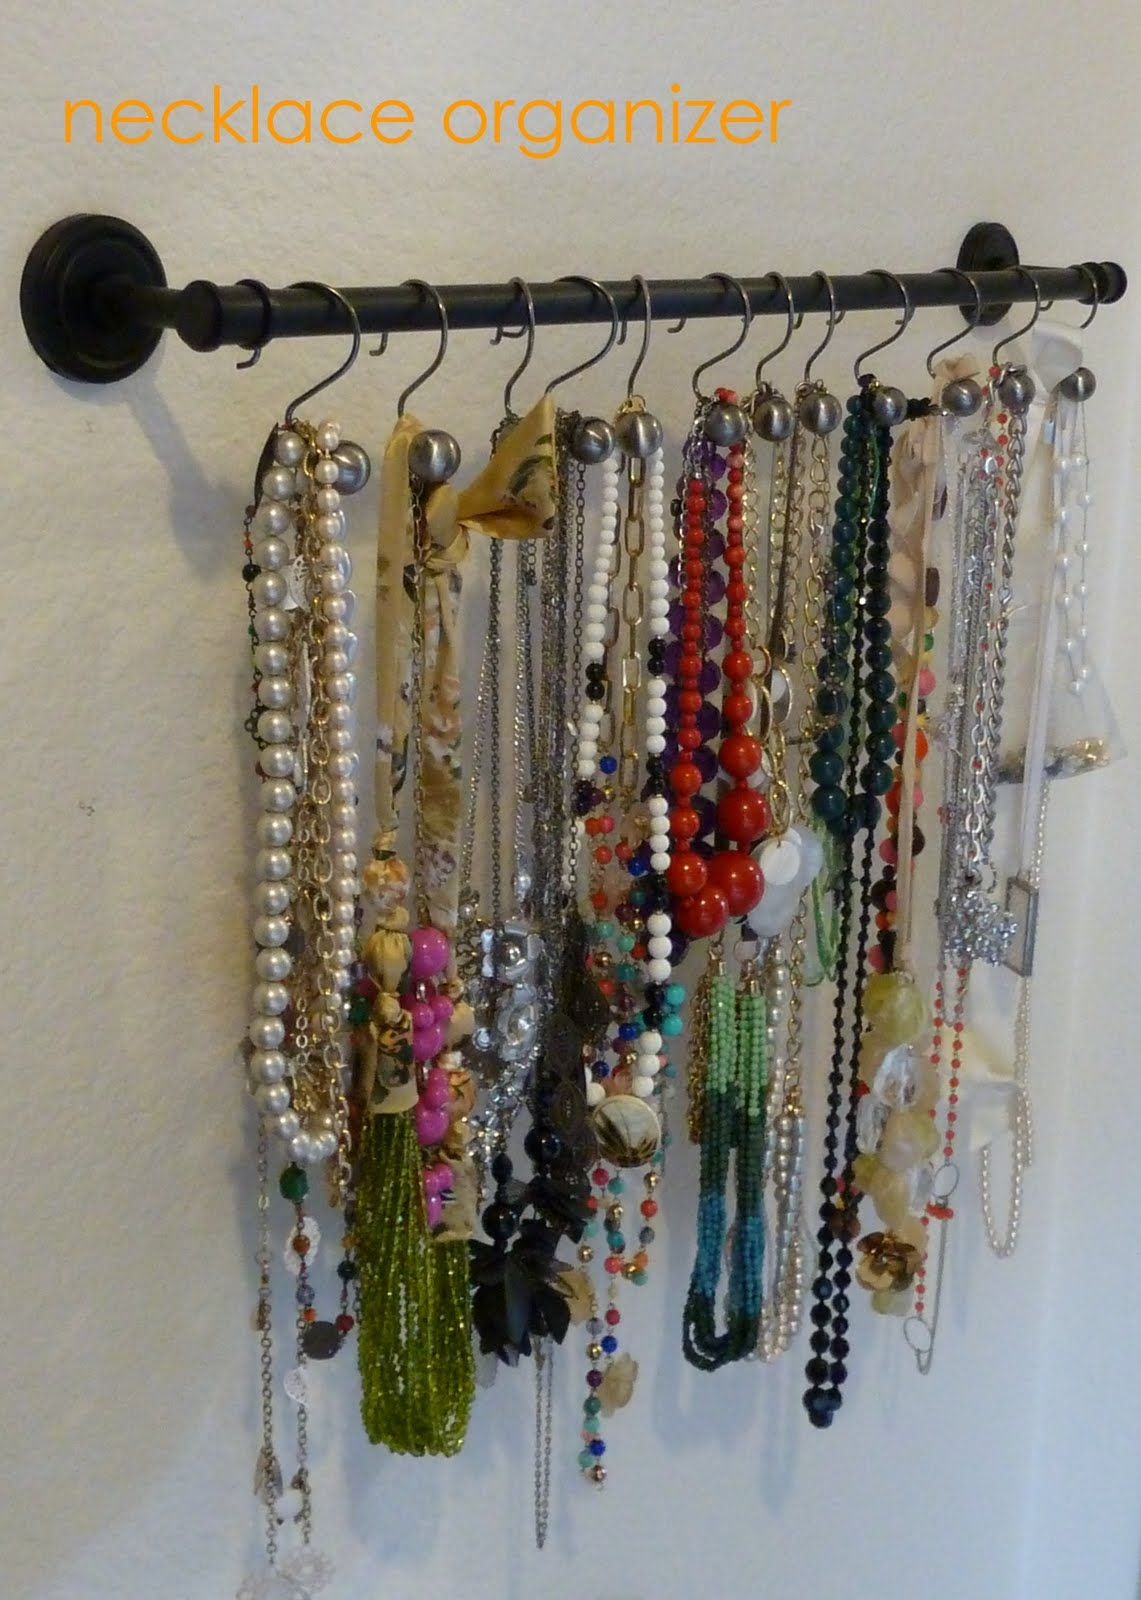 organizador de collares | Arreglos de mesa | Pinterest ...